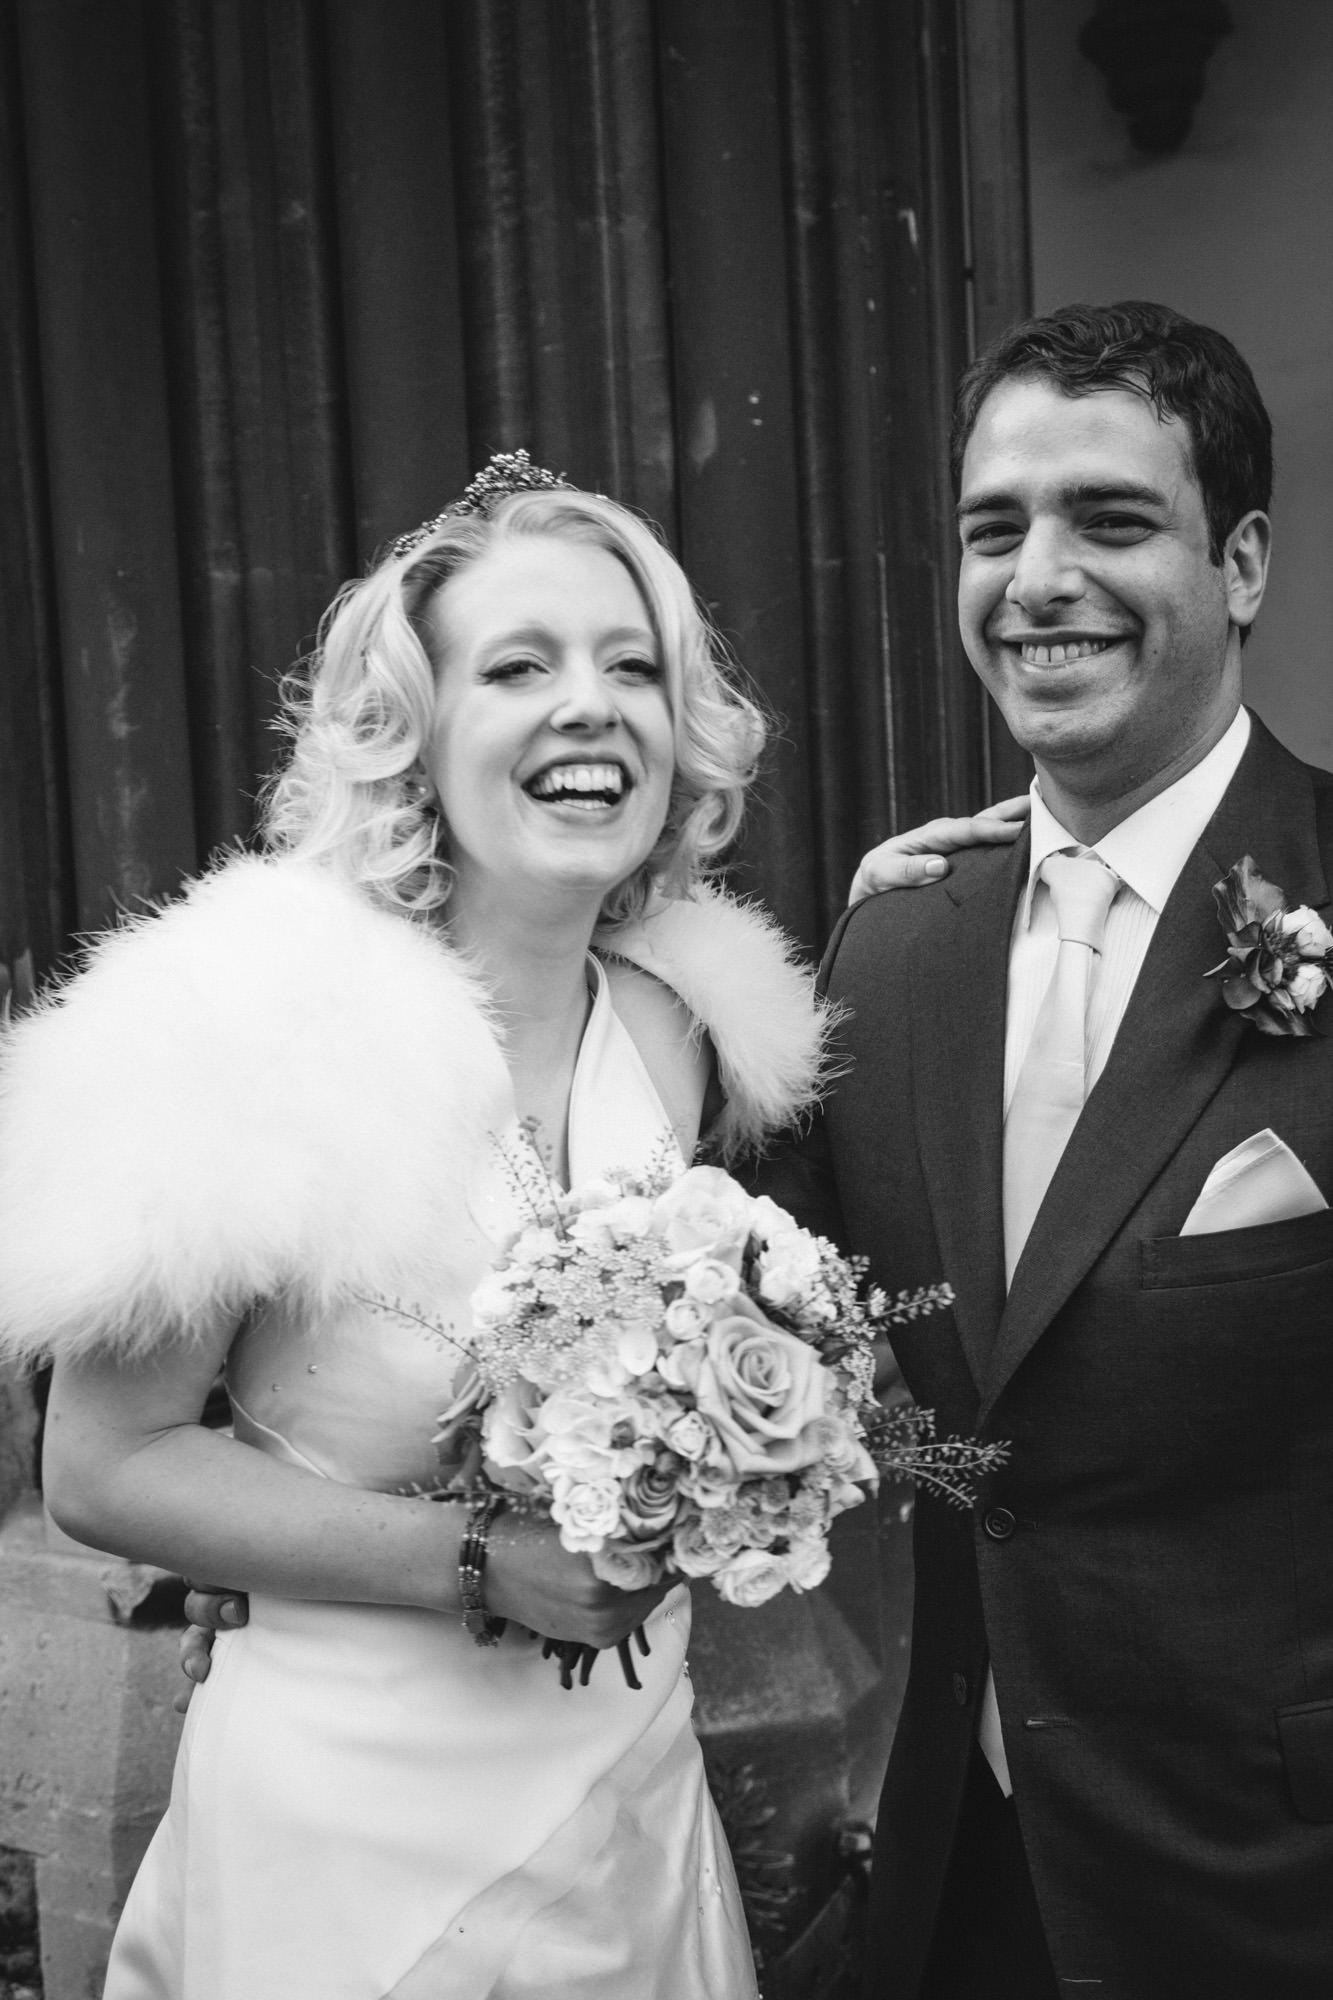 cambridge-wedding-photographer-io-1251-168-1.jpg